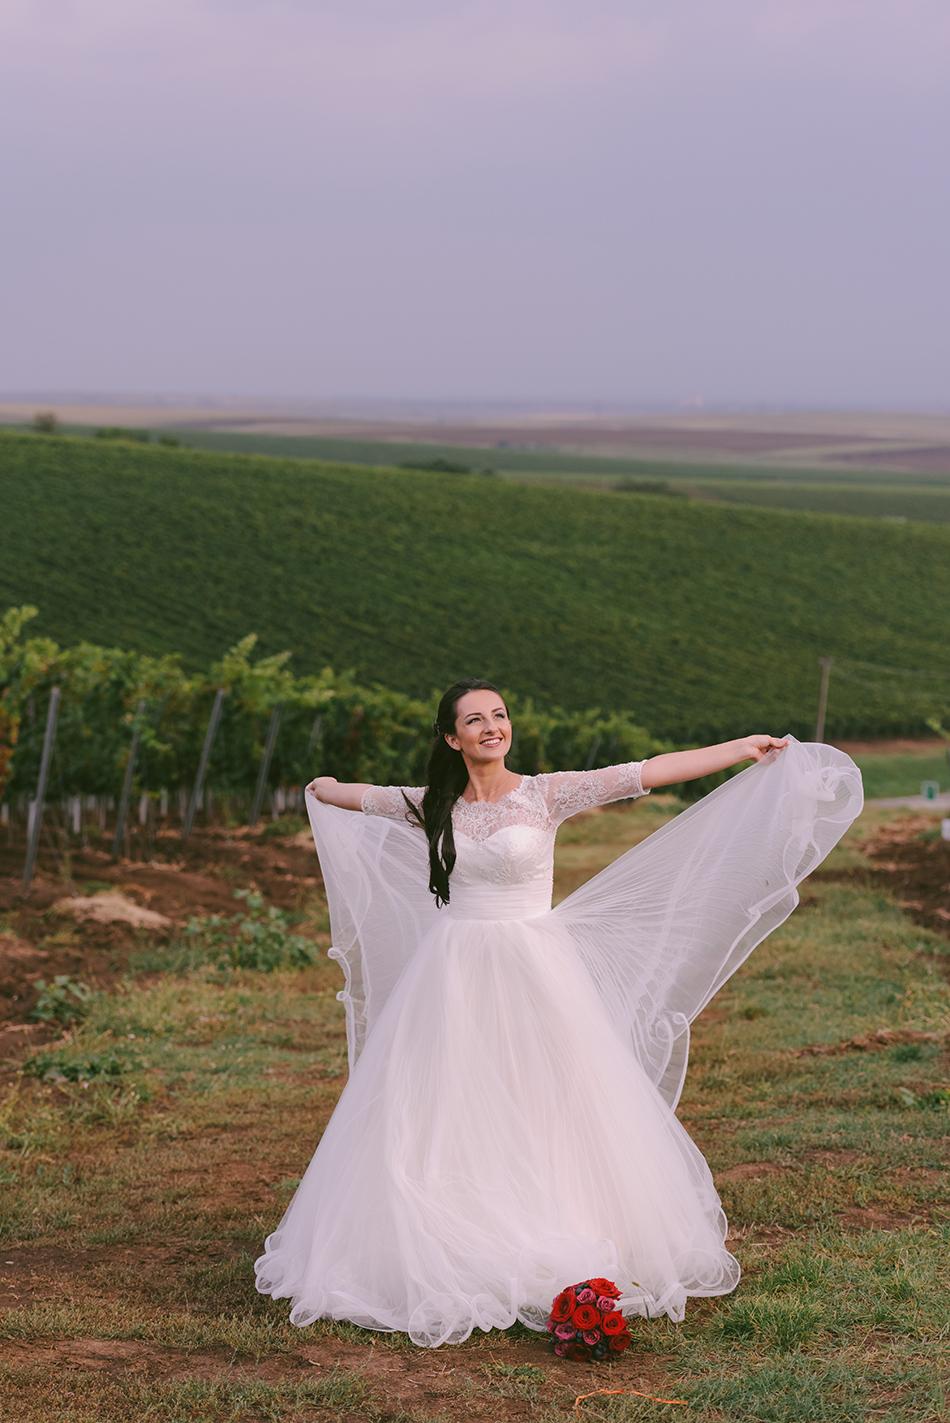 AD Passion Photography | damaris-si-gabi-ttd-afterwedding-timisoara_0006 | Adelin, Dida, fotograf profesionist, fotograf de nunta, fotografie de nunta, fotograf Timisoara, fotograf Craiova, fotograf Bucuresti, fotograf Arad, nunta Timisoara, nunta Arad, nunta Bucuresti, nunta Craiova